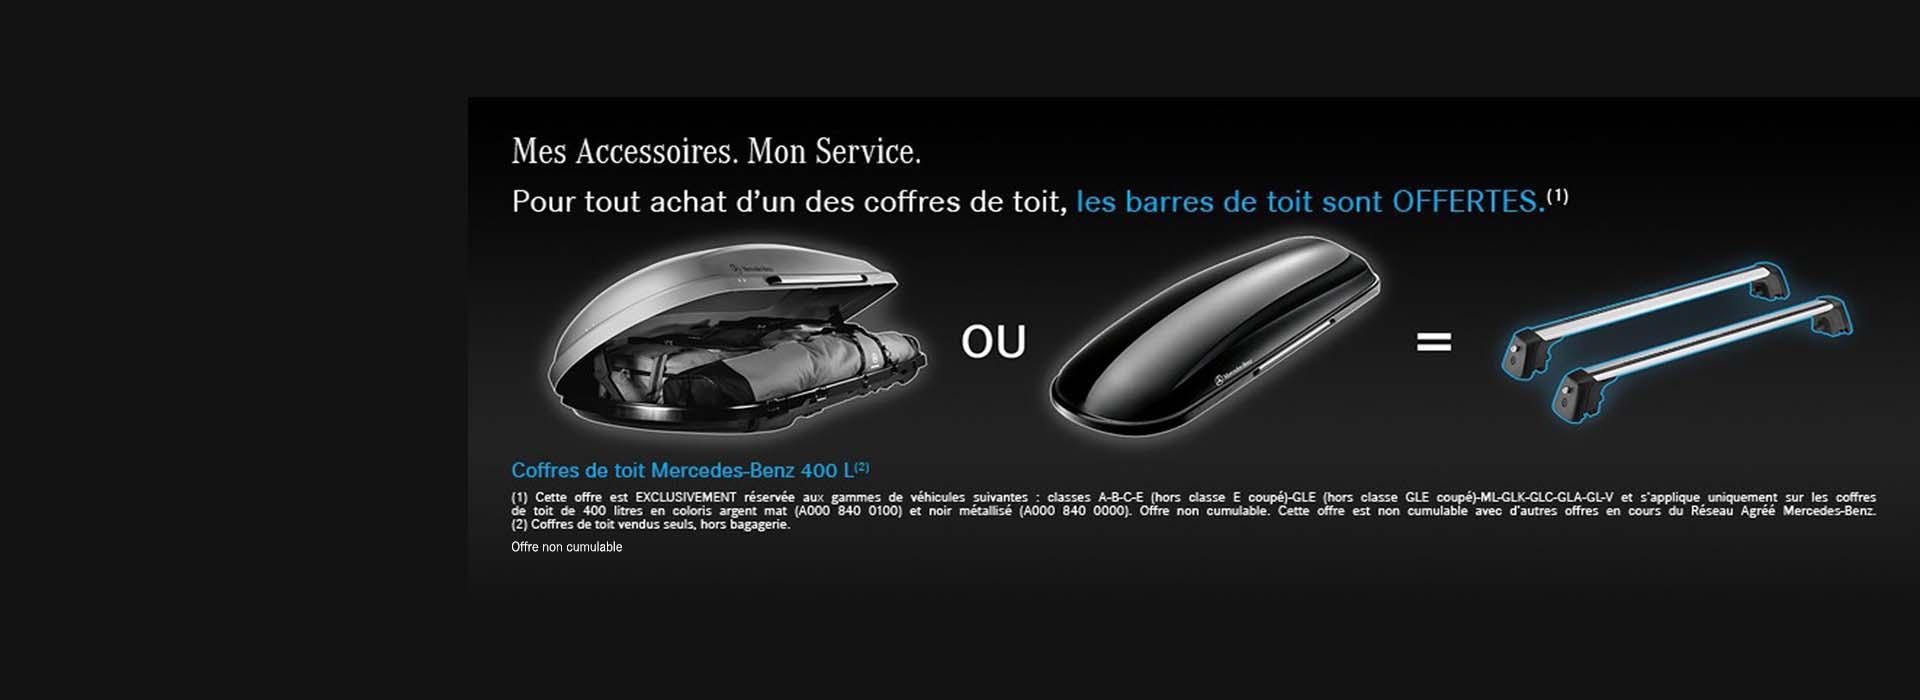 Occasion Mercedes Classe C Beauvais